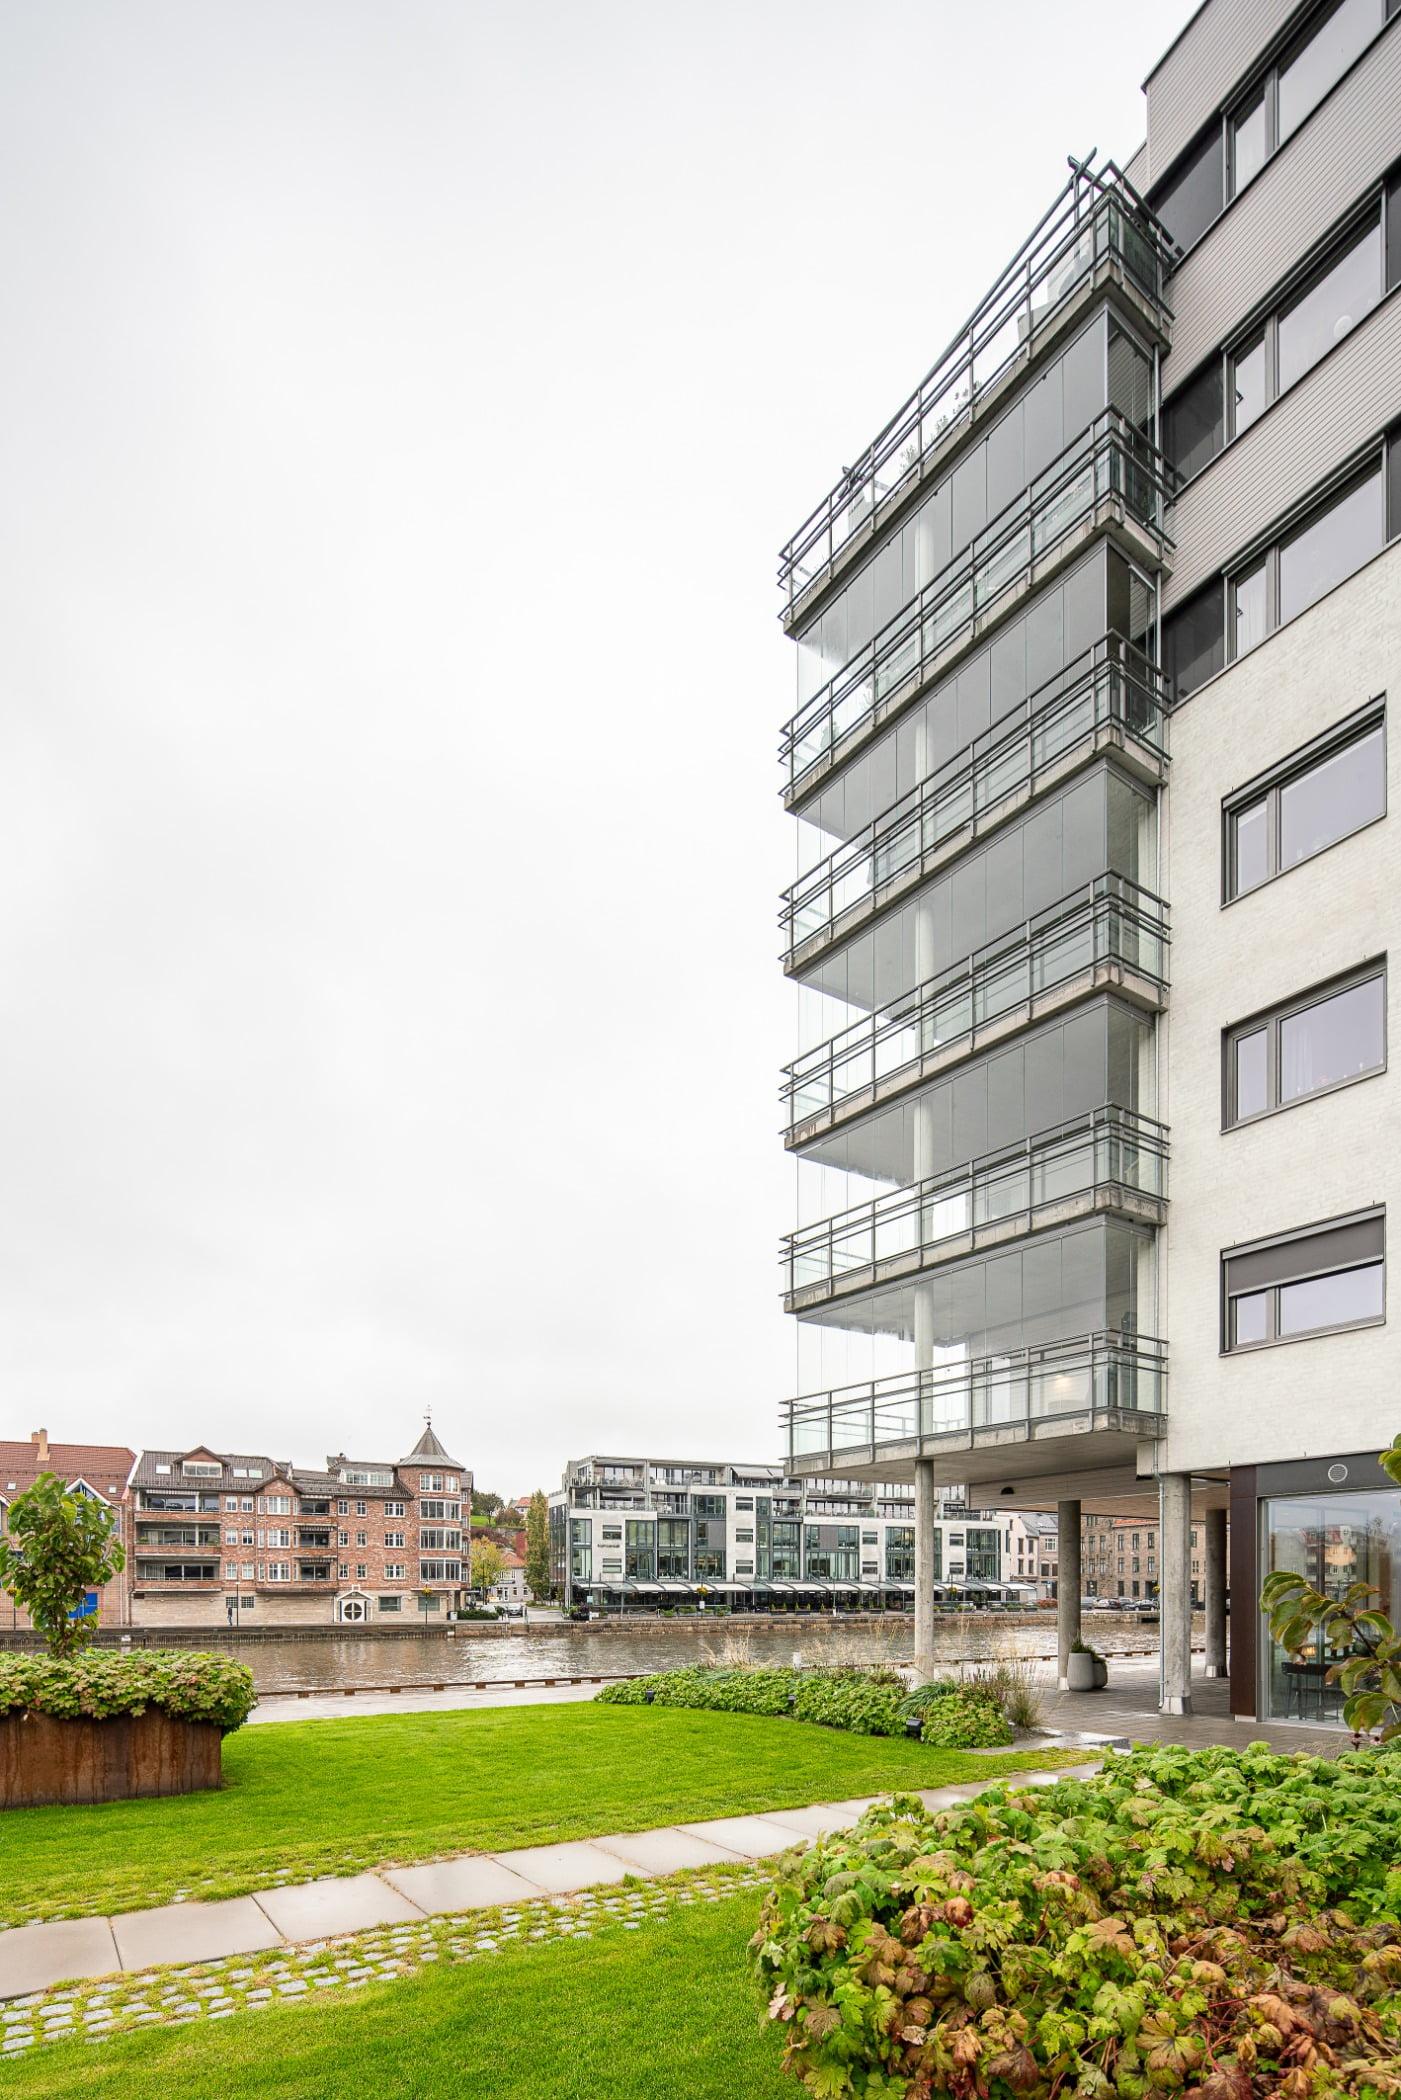 Urban design, Tower block, Residential area, Plant, Building, Sky, Grass, Condominium, Neighbourhood